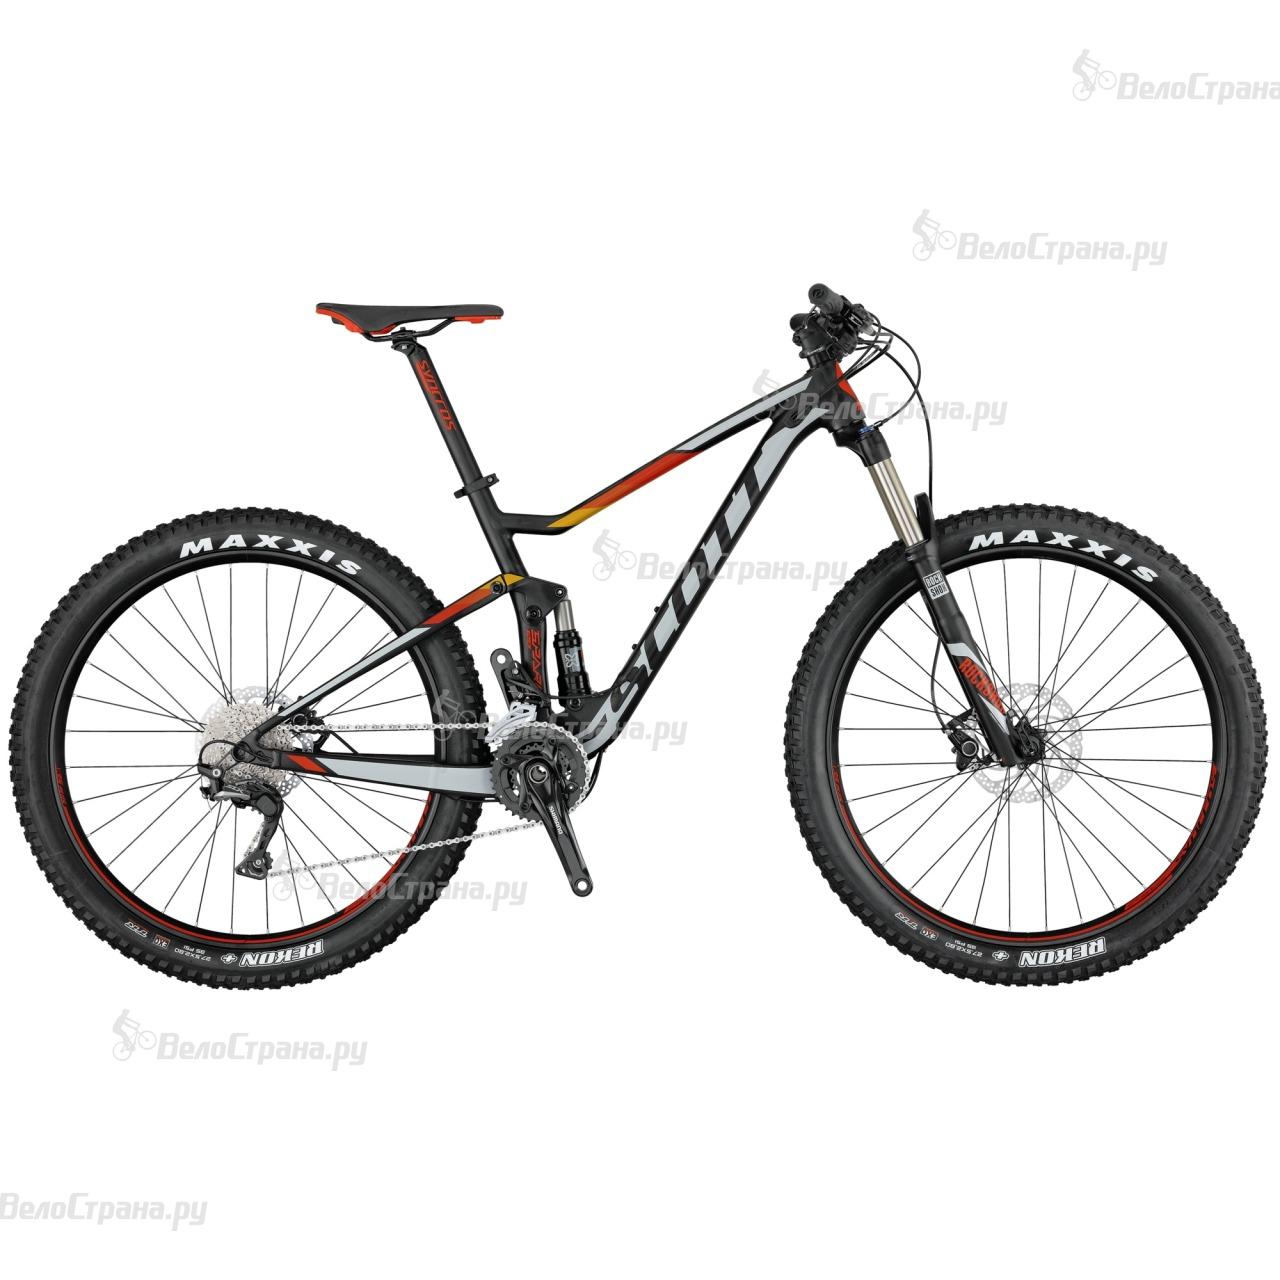 Велосипед Scott Spark 730 Plus (2017)